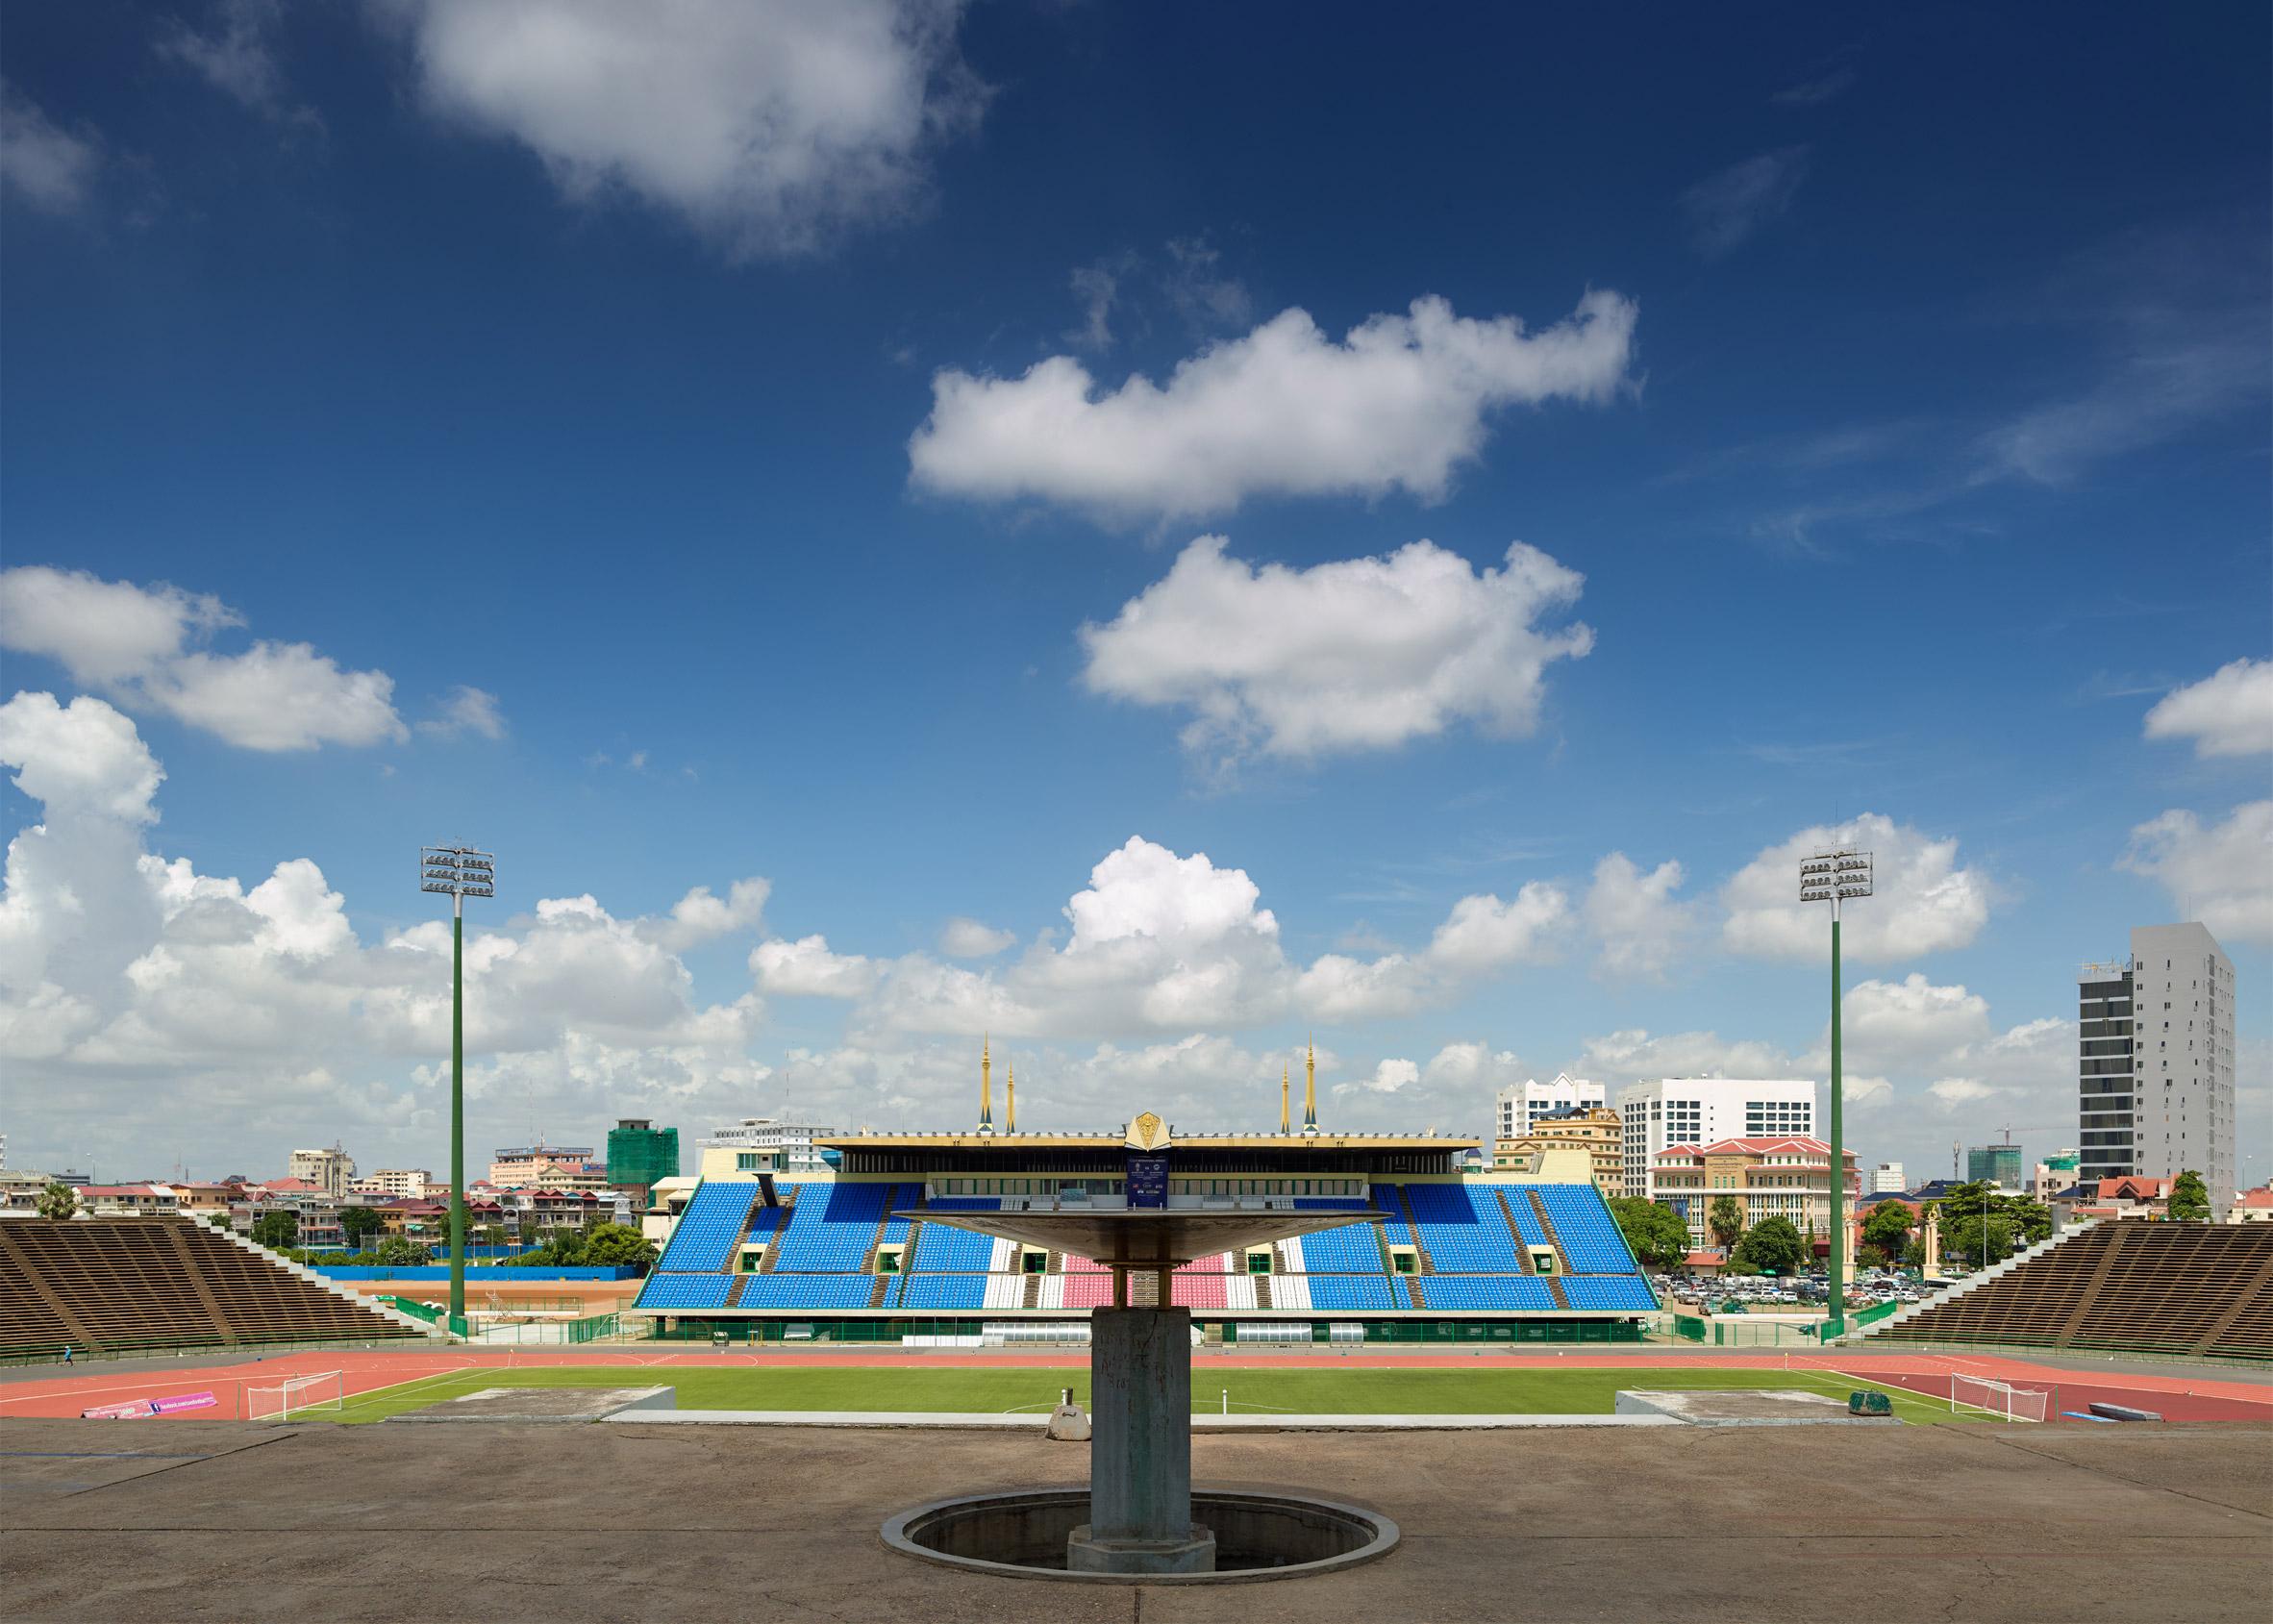 The National Olympic Stadium by Van Molyvann